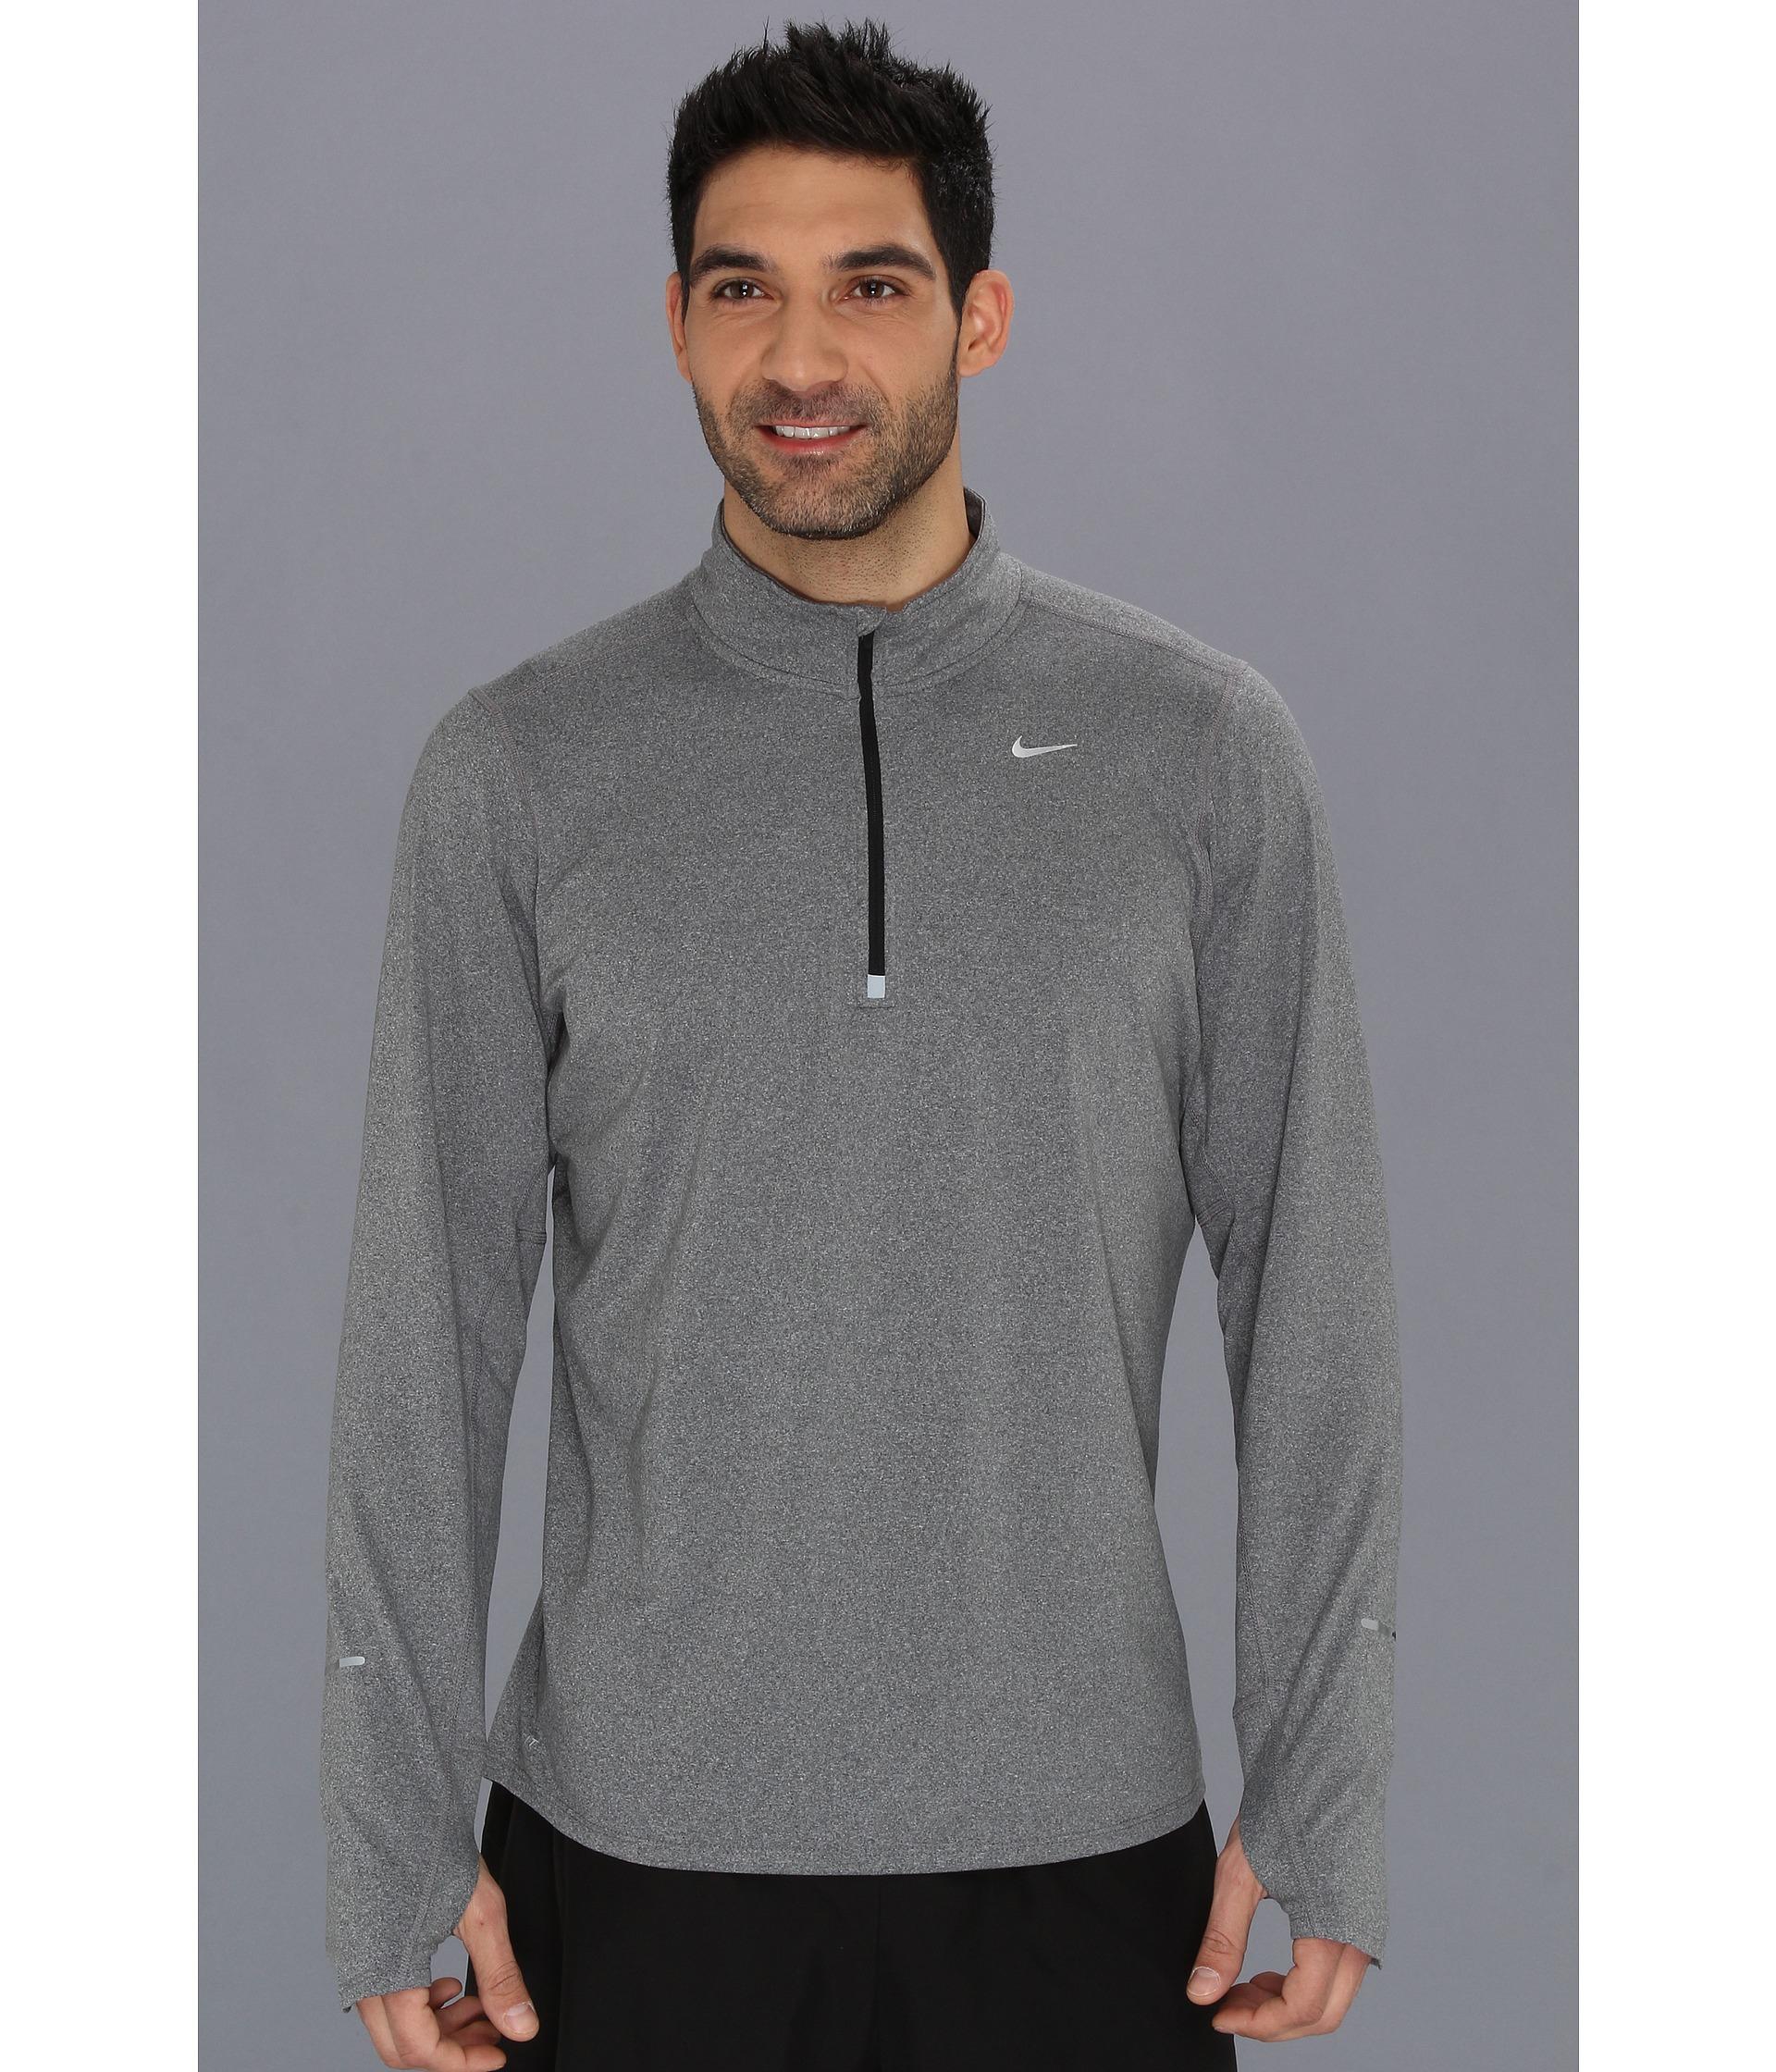 687a073dc79b Lyst - Nike Element Half-Zip in Gray for Men